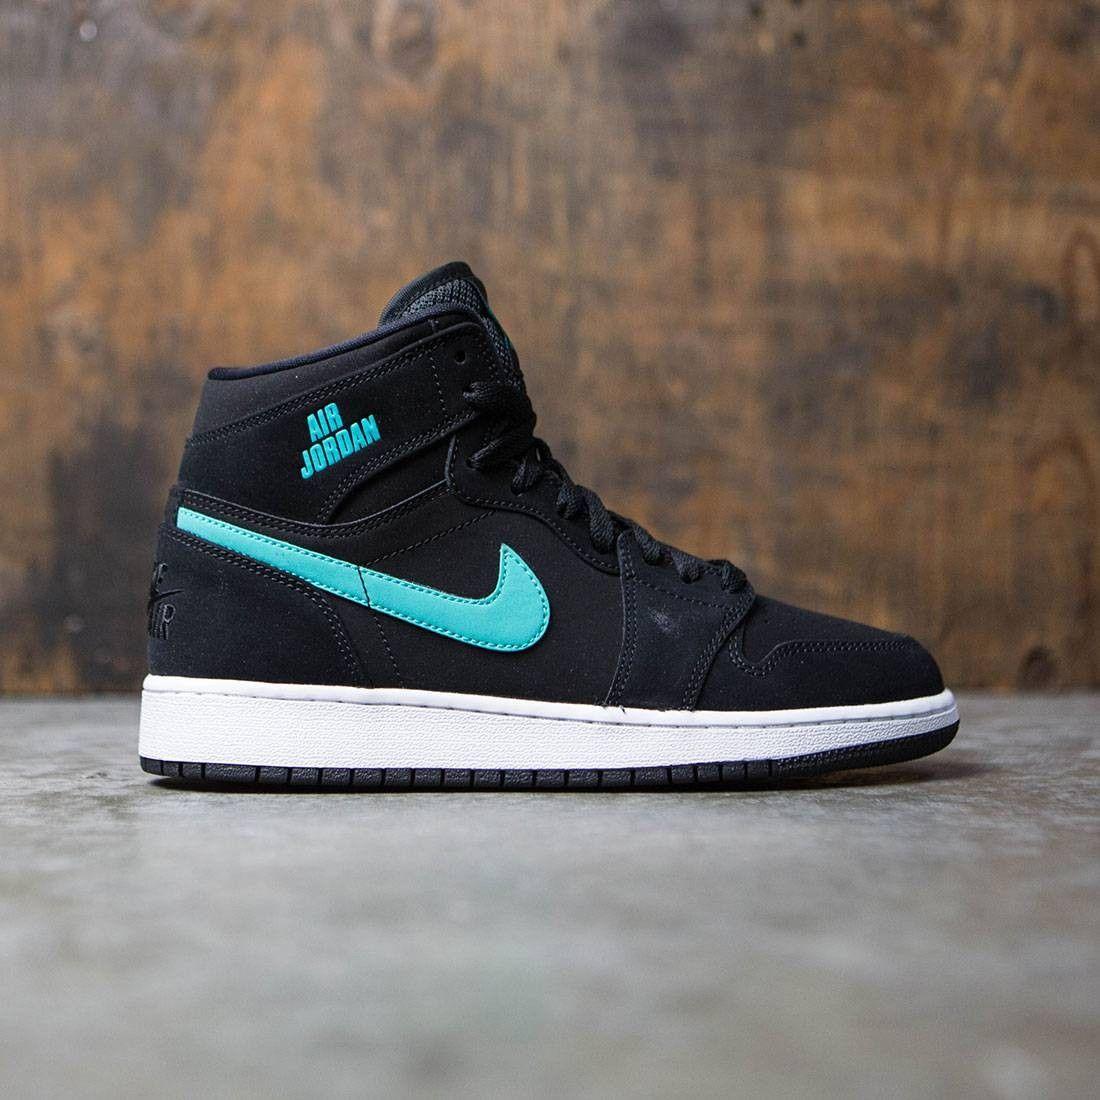 buy online 1ecb6 a77a8 Jordan Big Kids Air Jordan 1 Retro High (GS) (black / hyper jade-white)